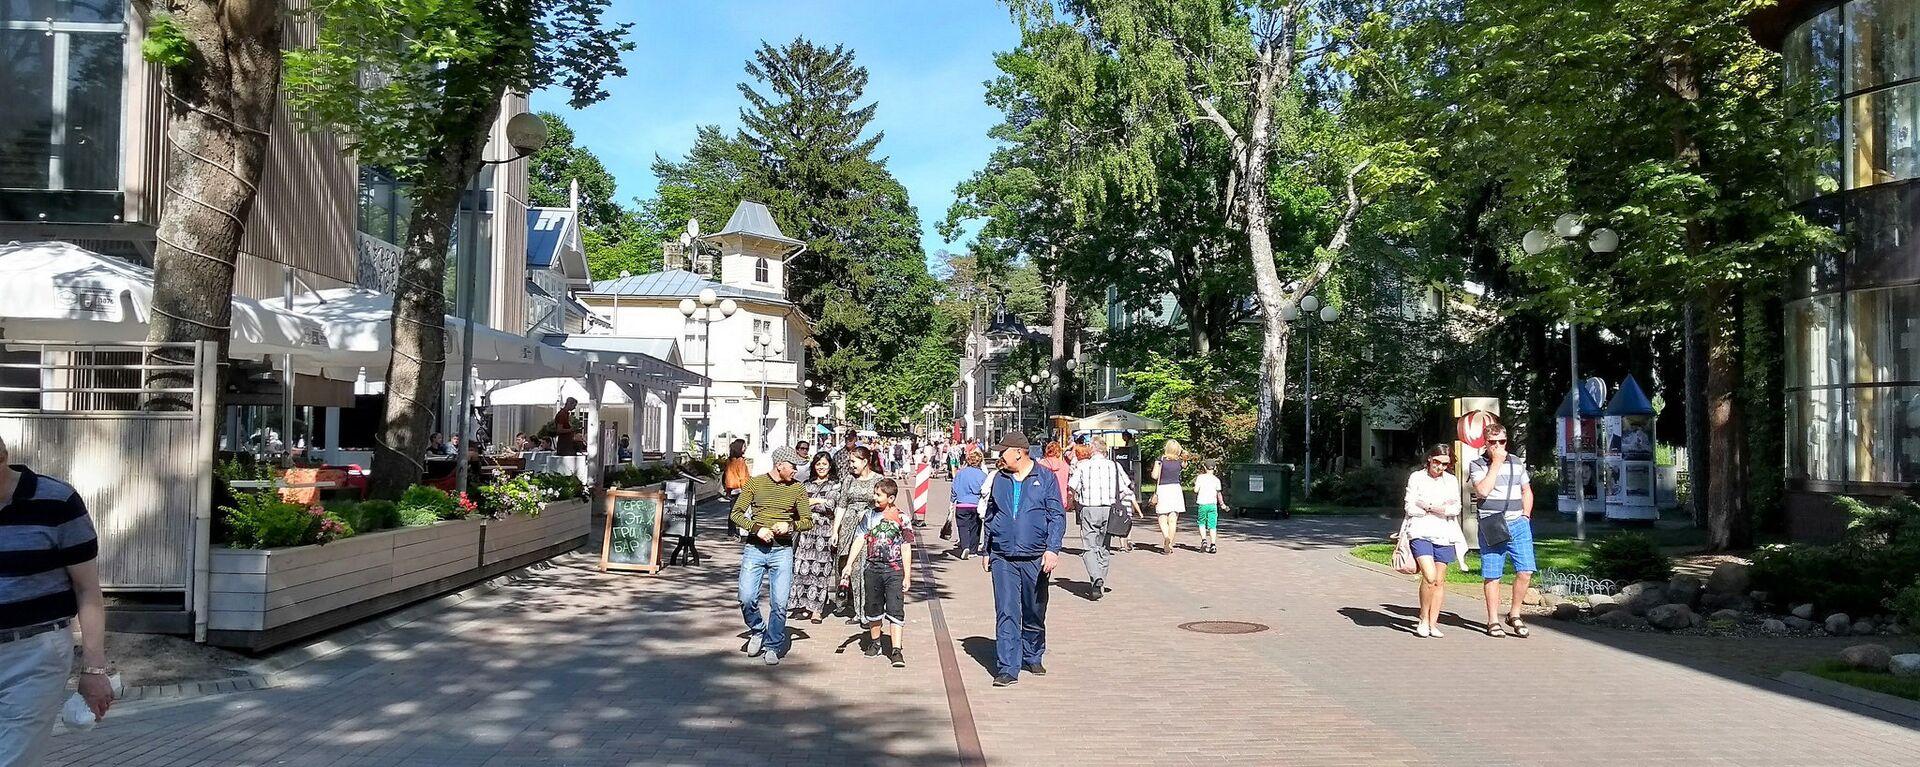 Юрмала улица Йомас - Sputnik Латвия, 1920, 14.09.2021